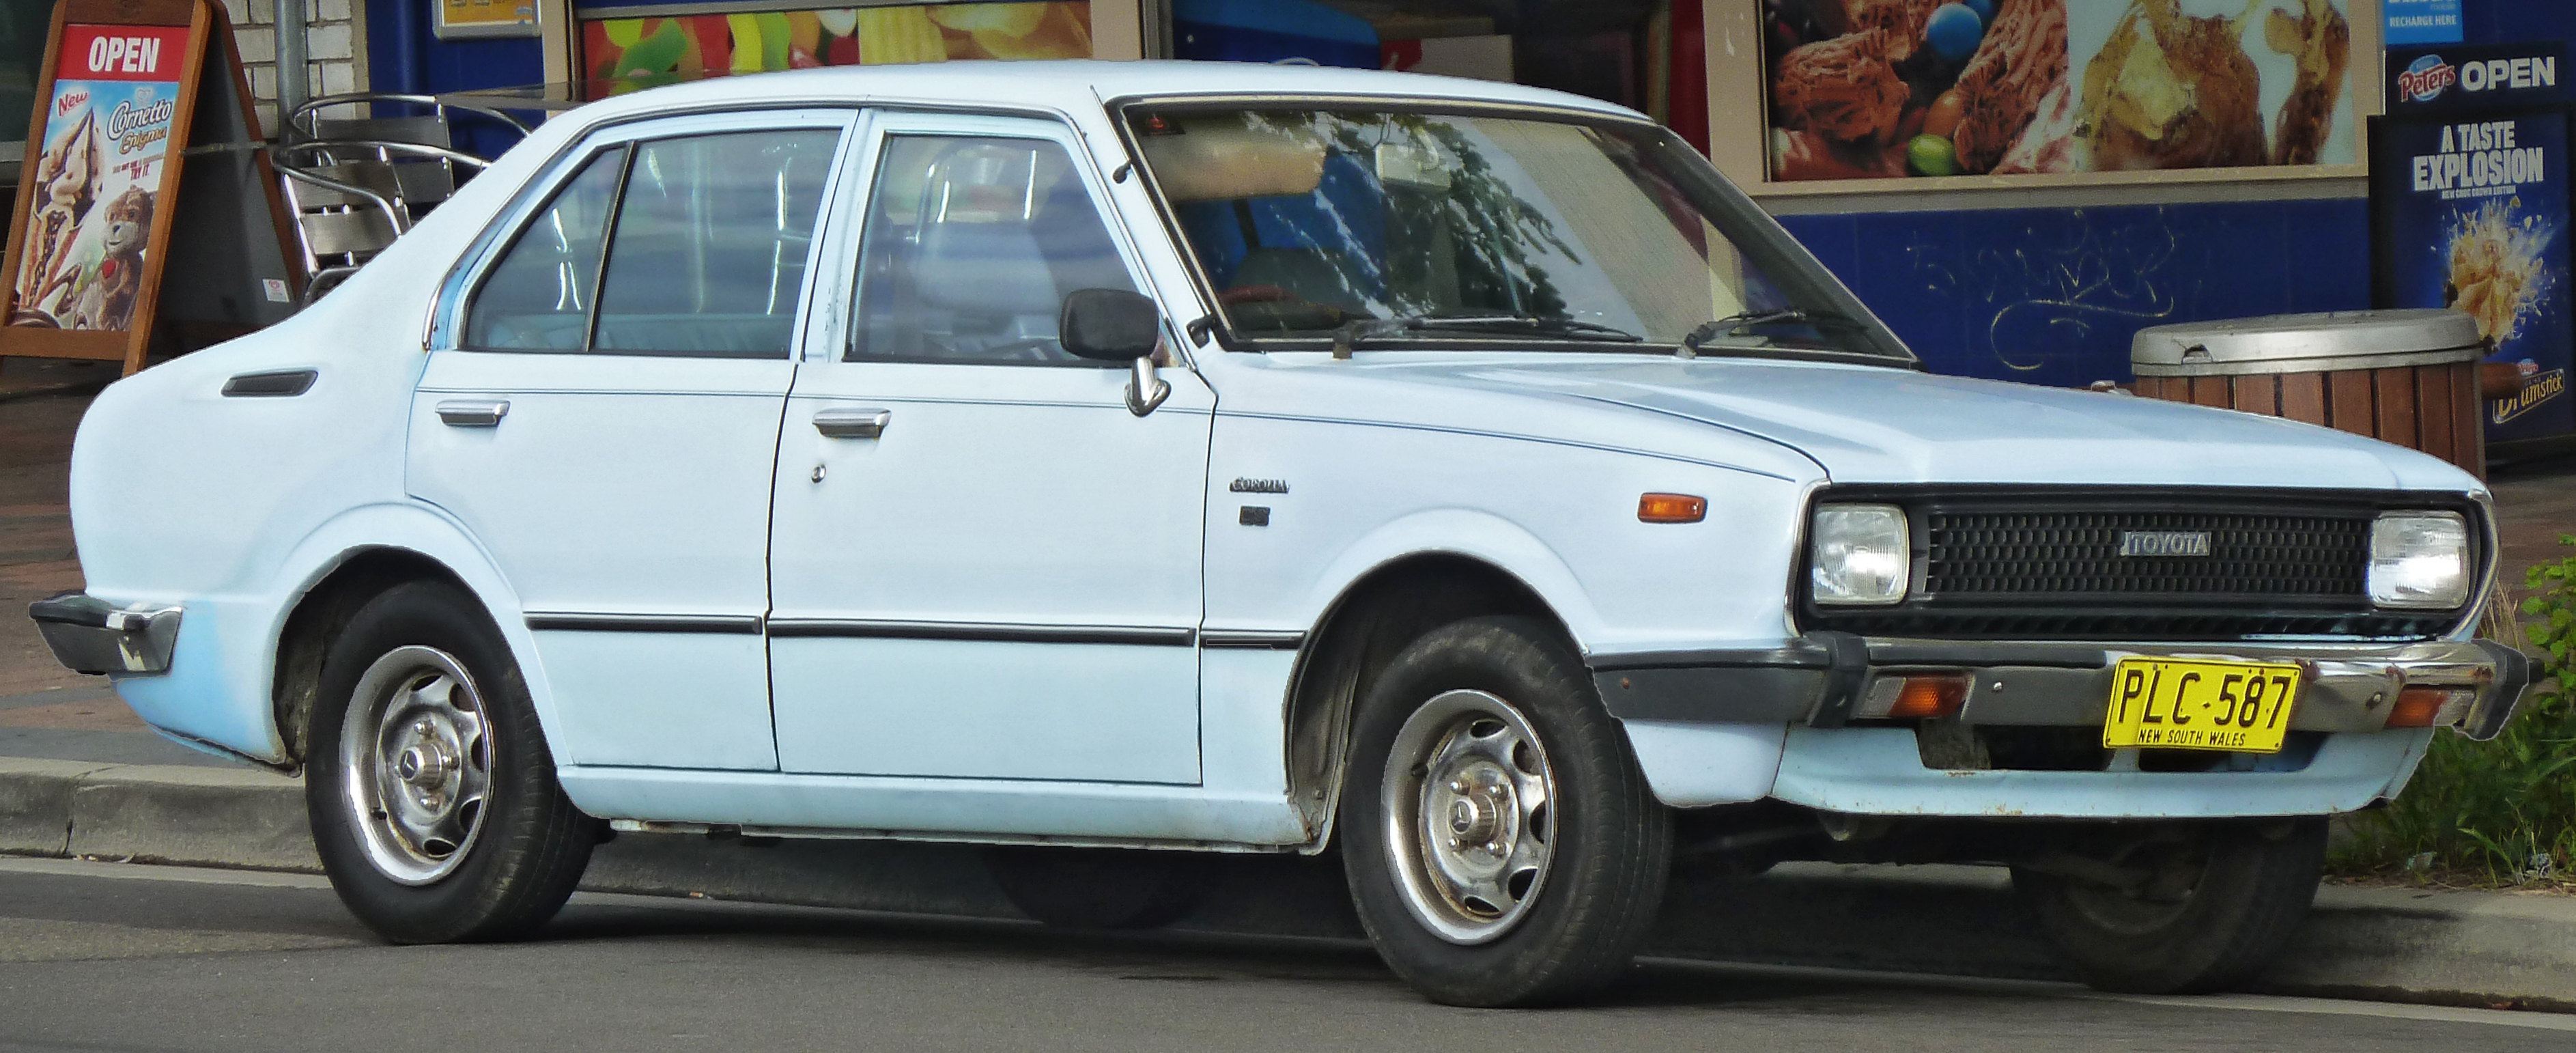 Toyota corolla ke 55